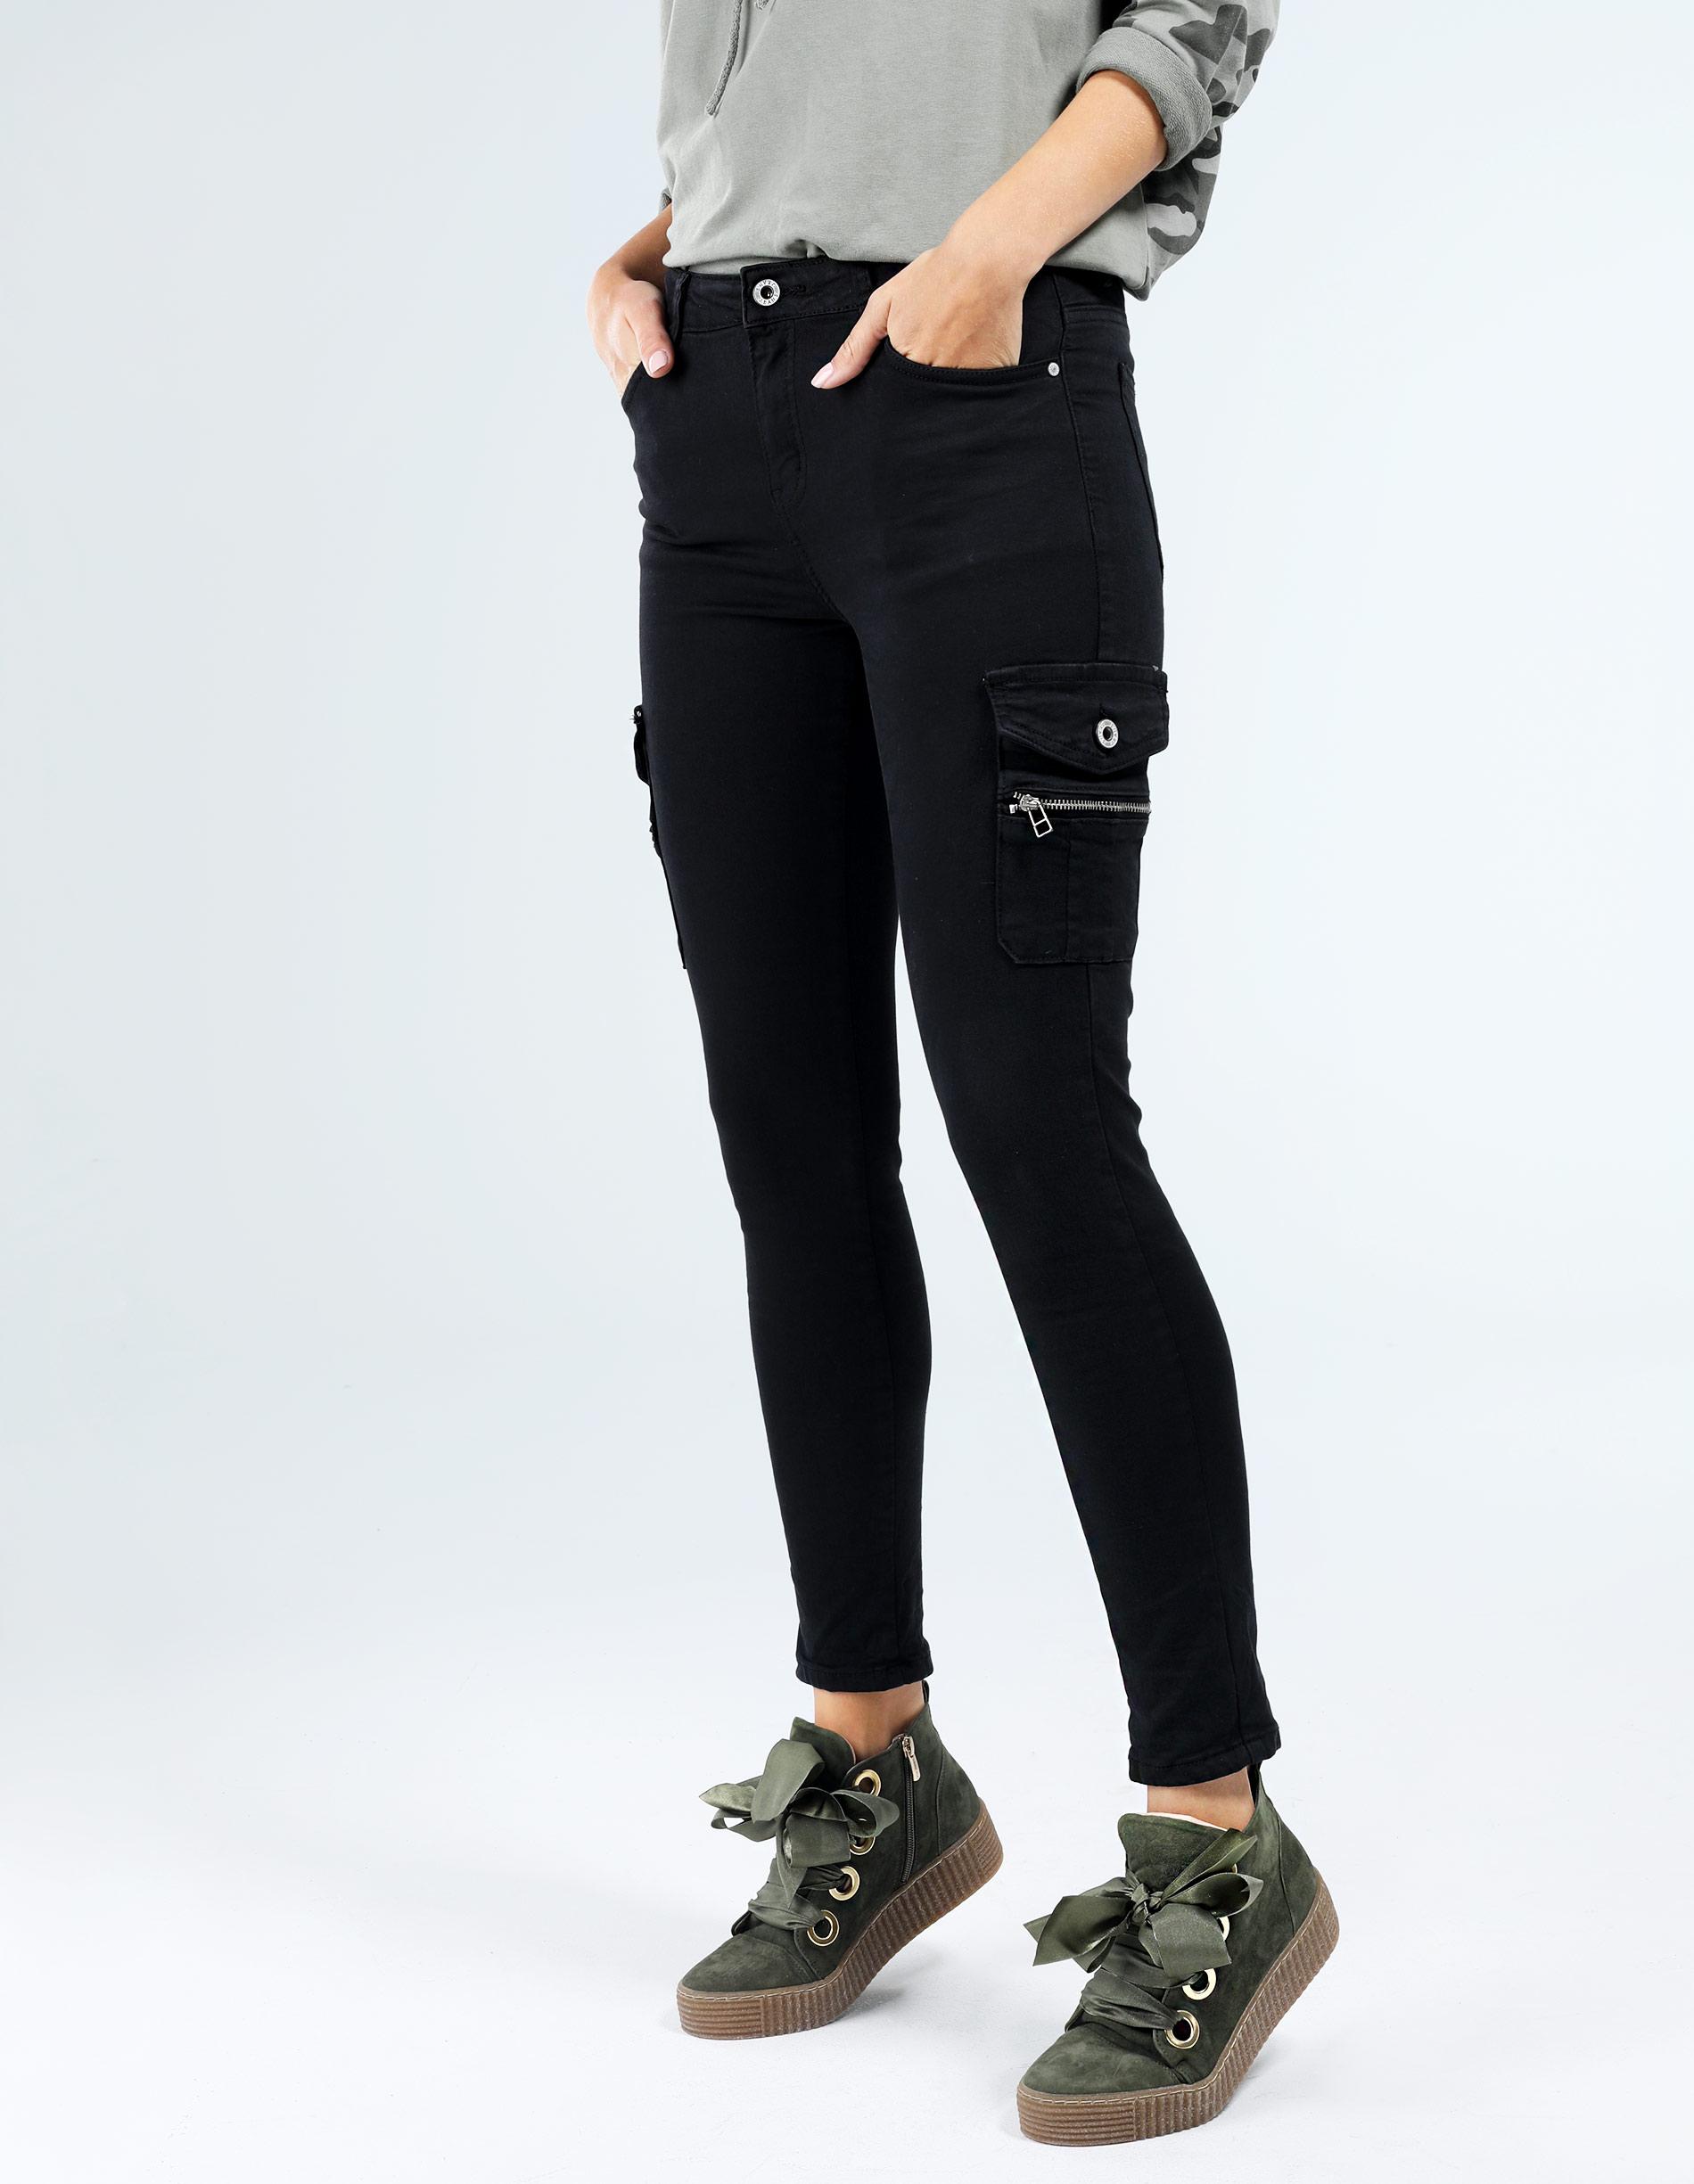 Spodnie - 154-9937 NERO - Unisono